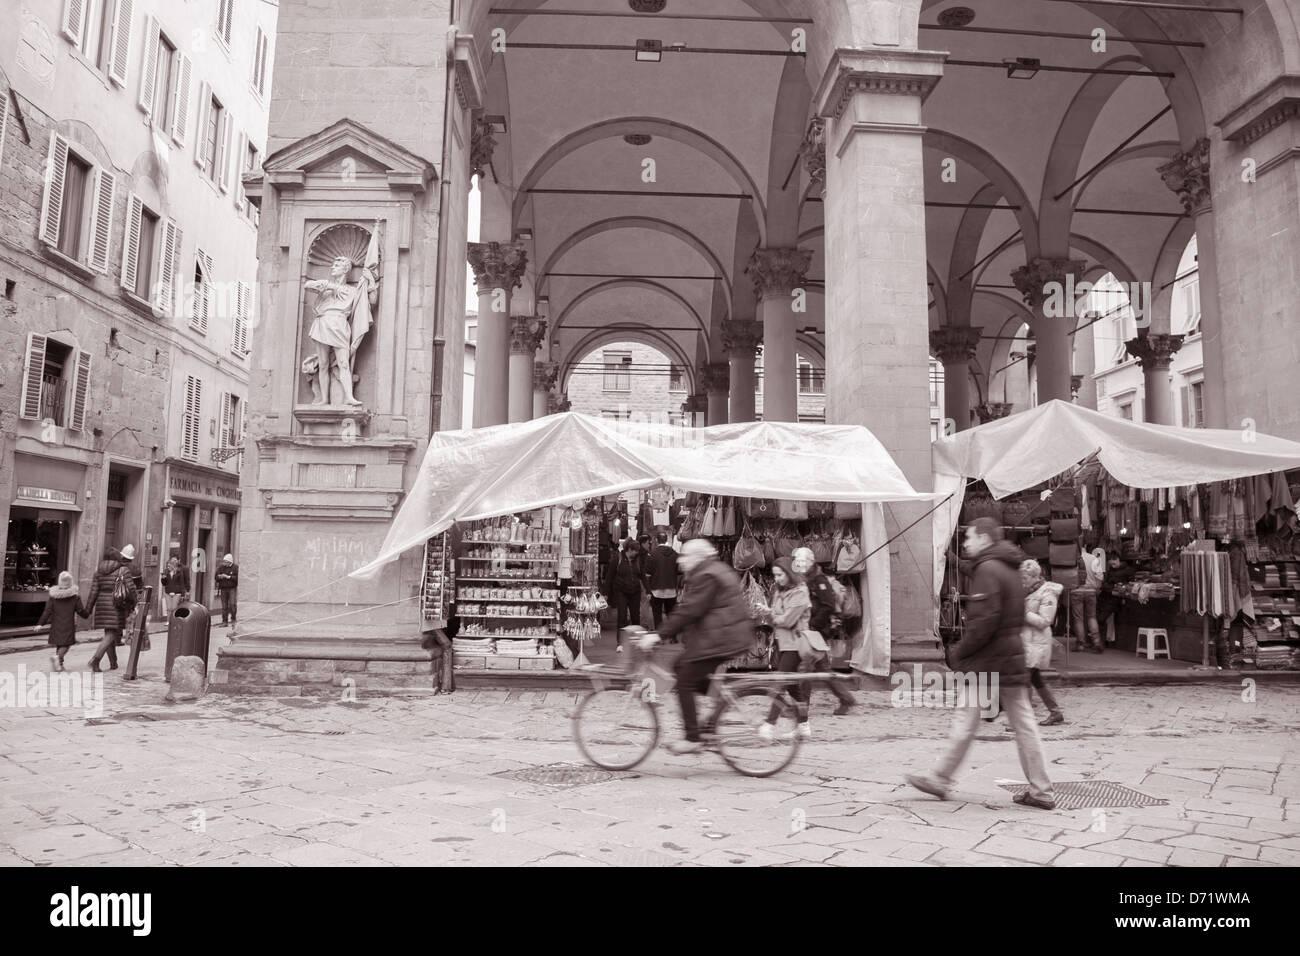 Mercato Nuovo - New Market, Florence; Italy in Black and White Sepia Tone - Stock Image